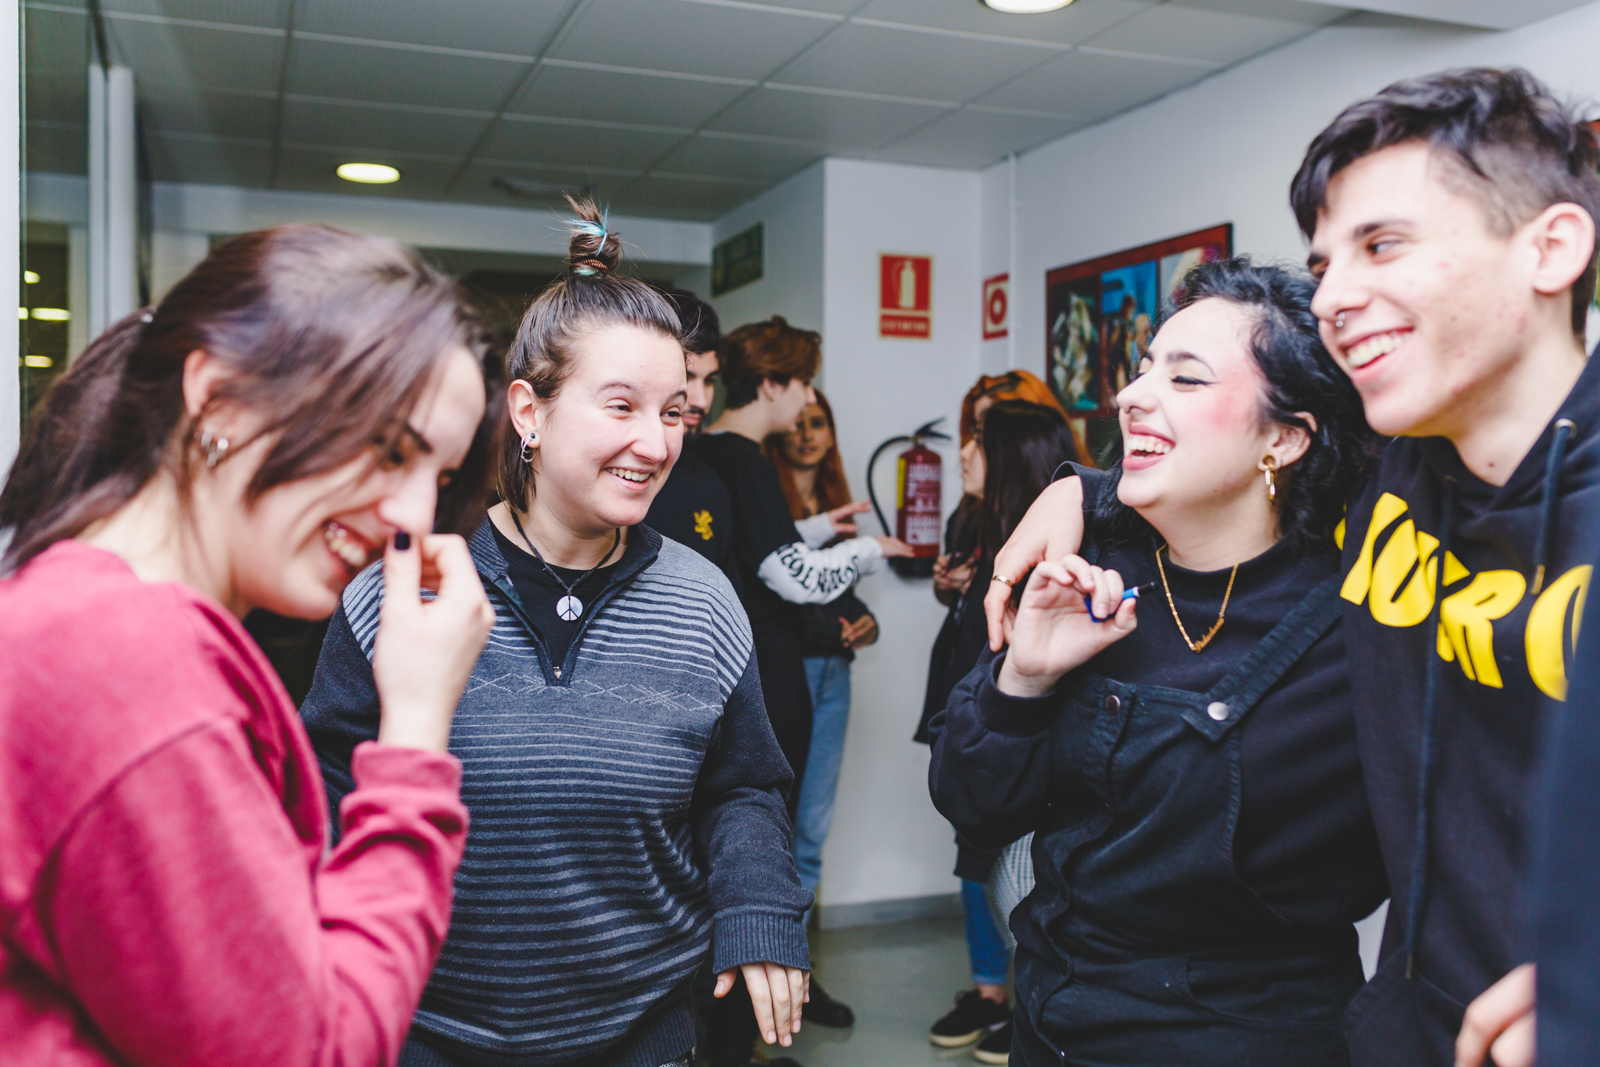 escuela-de-comic-joso-barcelona-fotografia-corporativa-misshappyflash-54.jpg